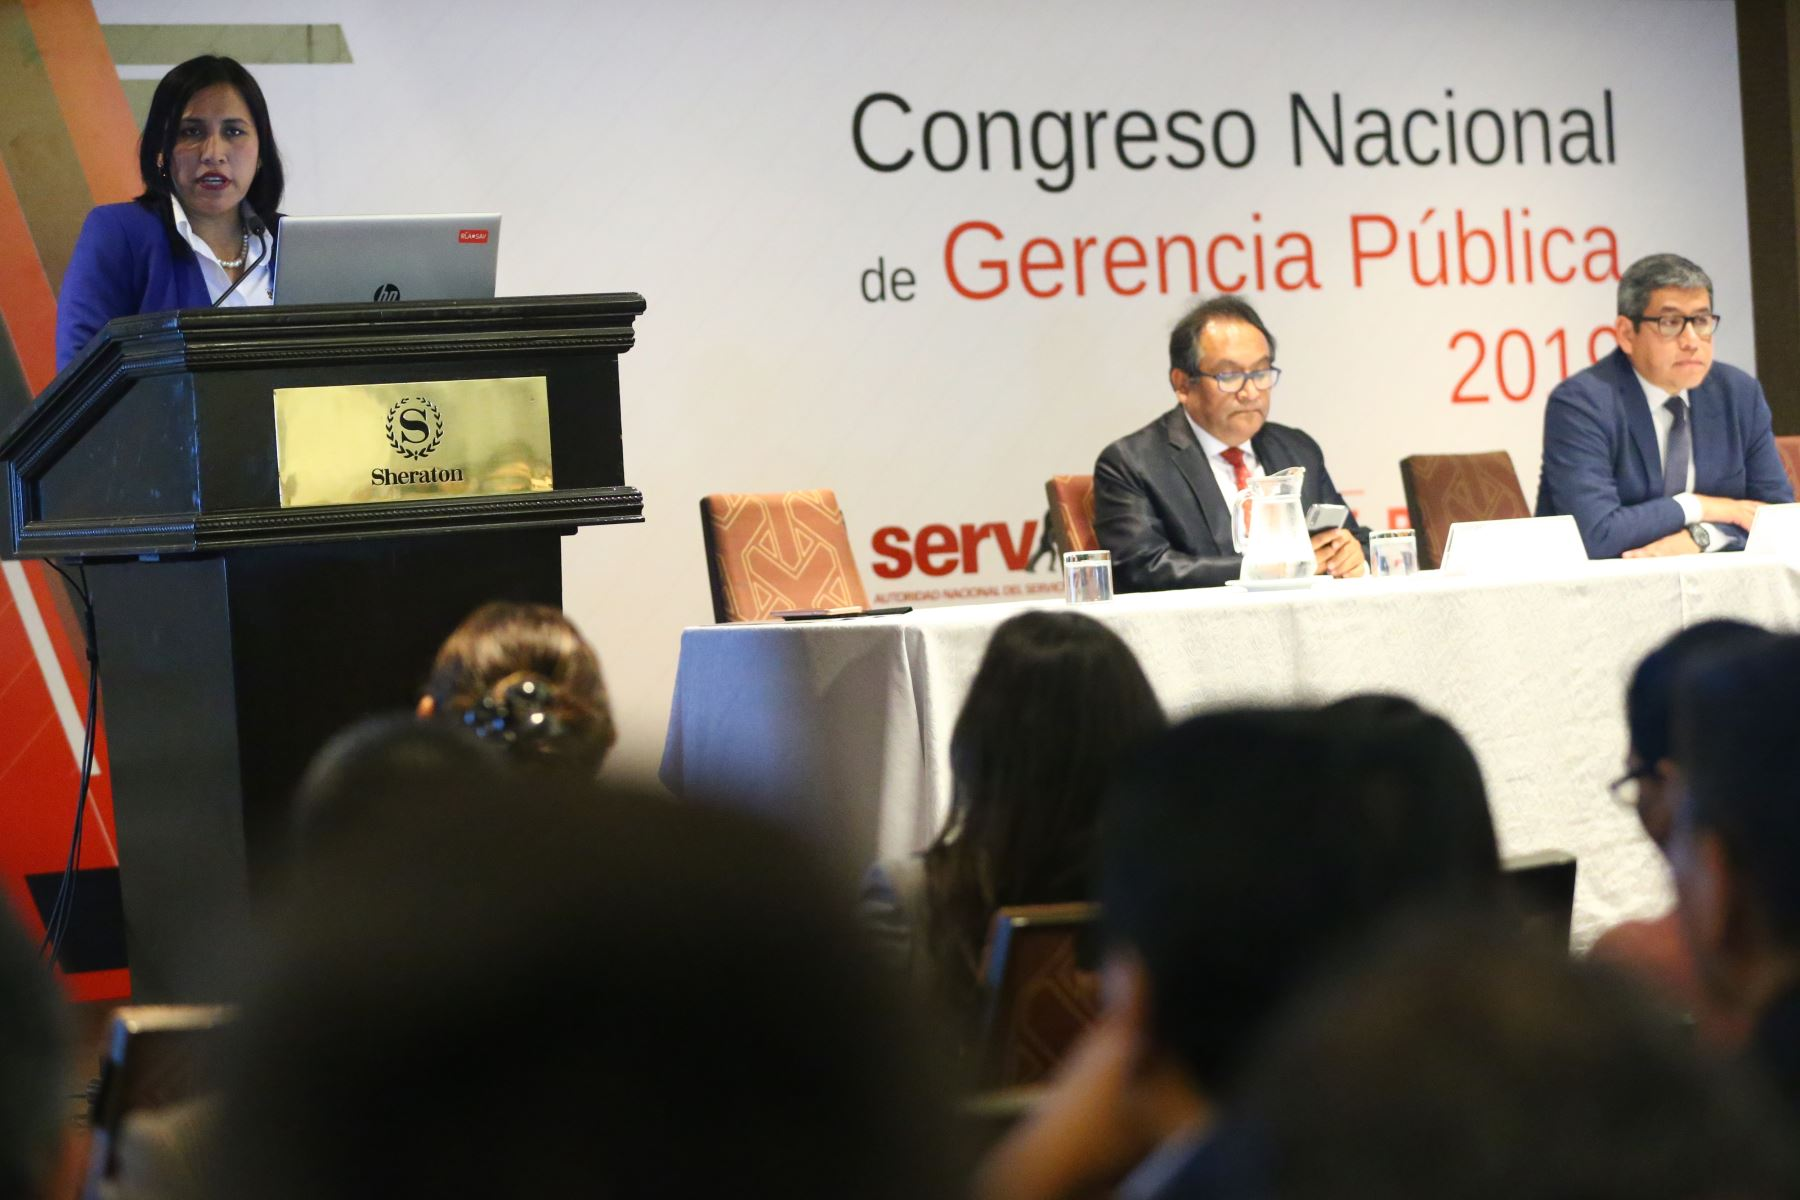 Foto: ANDINA/Melina Mejía